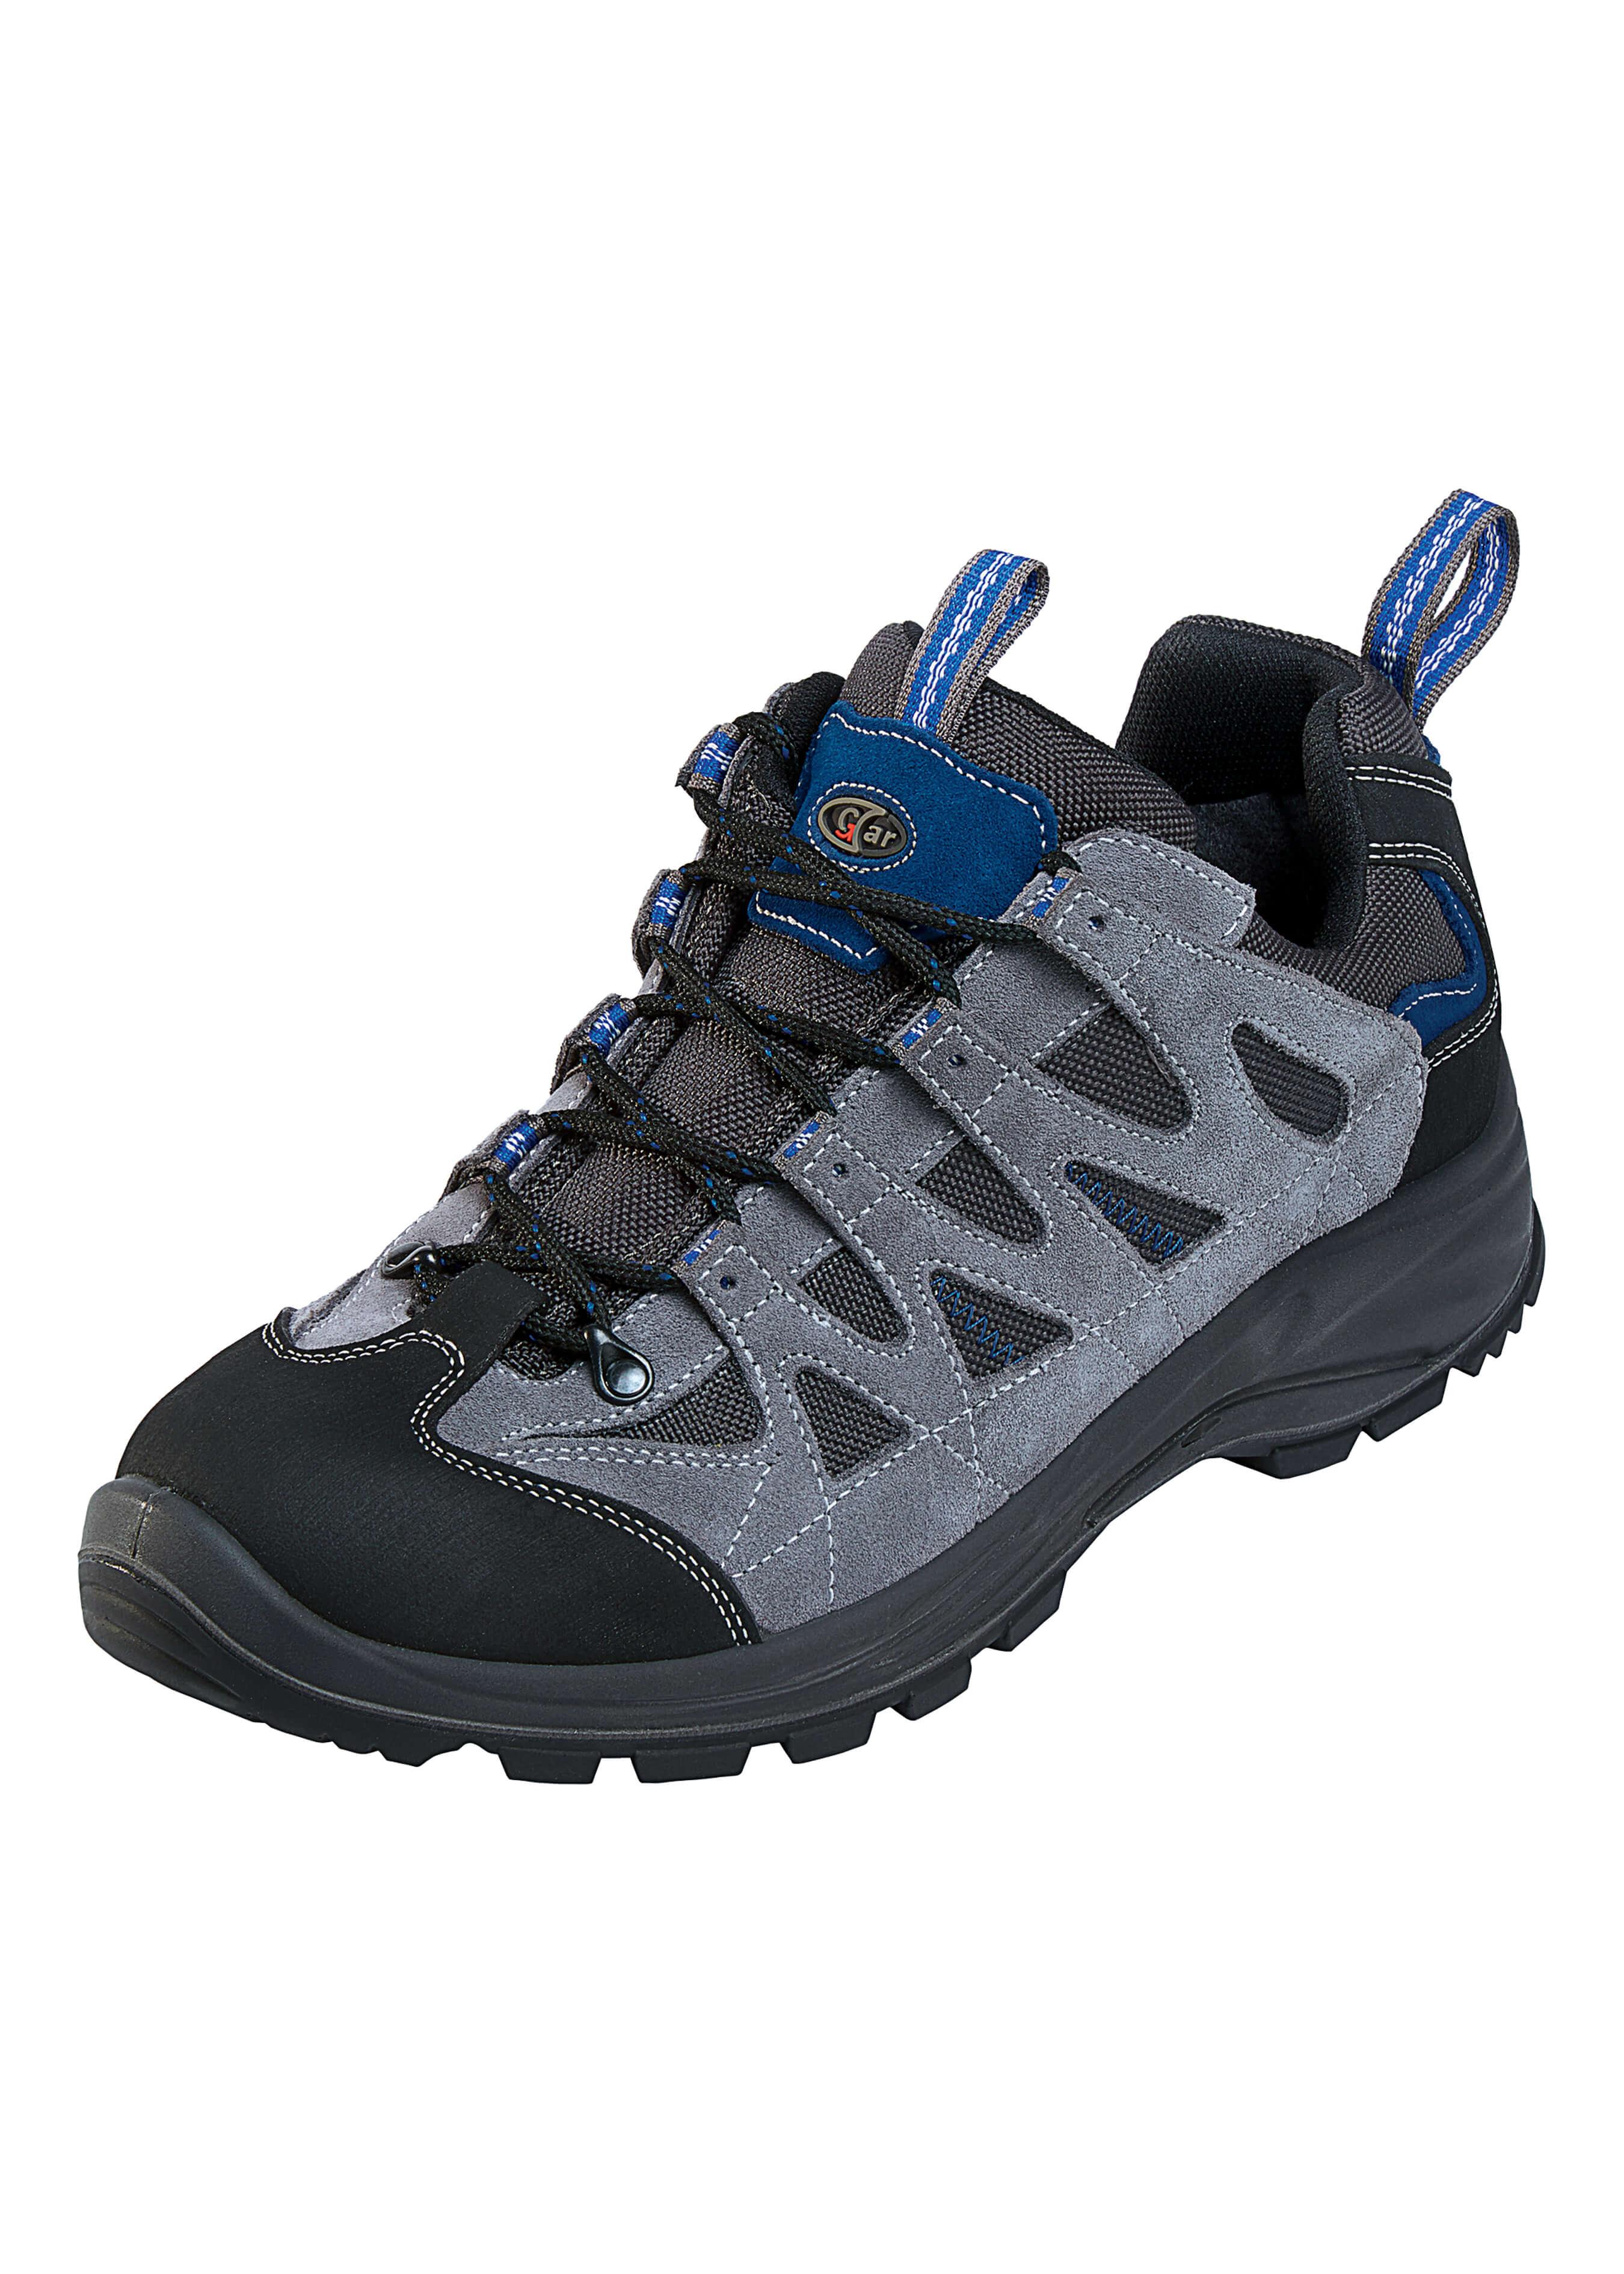 Chaussure polyvalente en daim 41371136 1